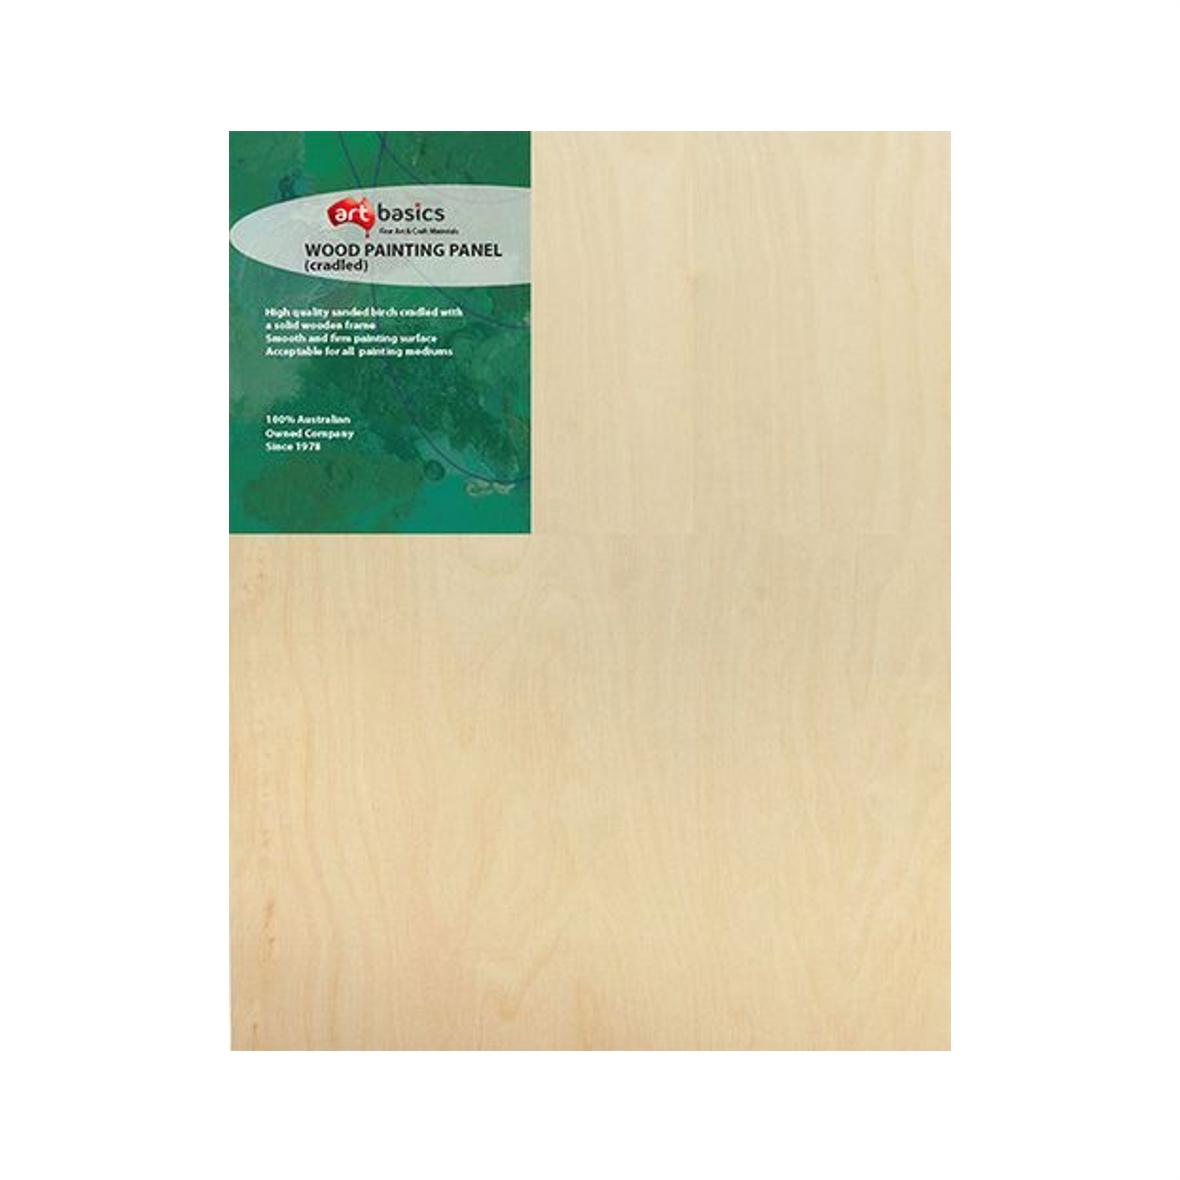 "Wood Painting Panel 20.3cm/8"" square"